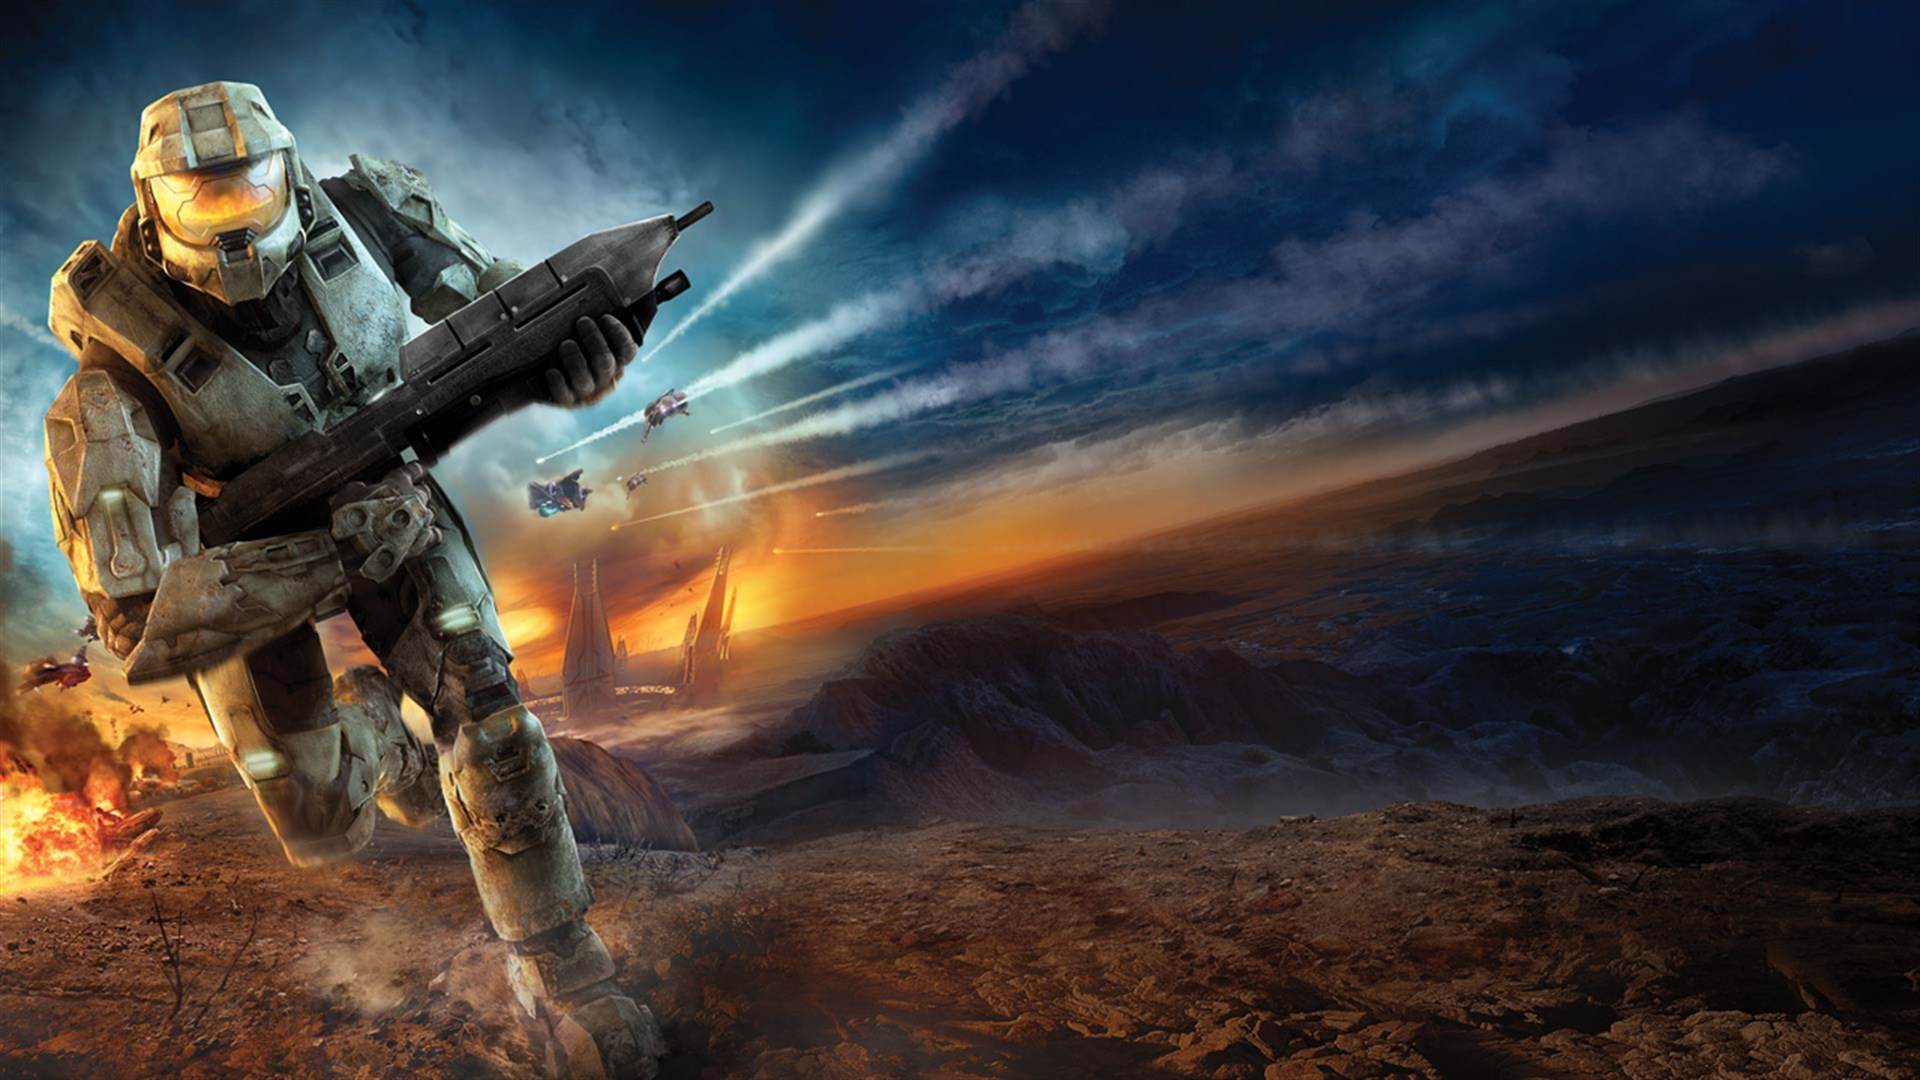 Buy Halo 3 Microsoft Store